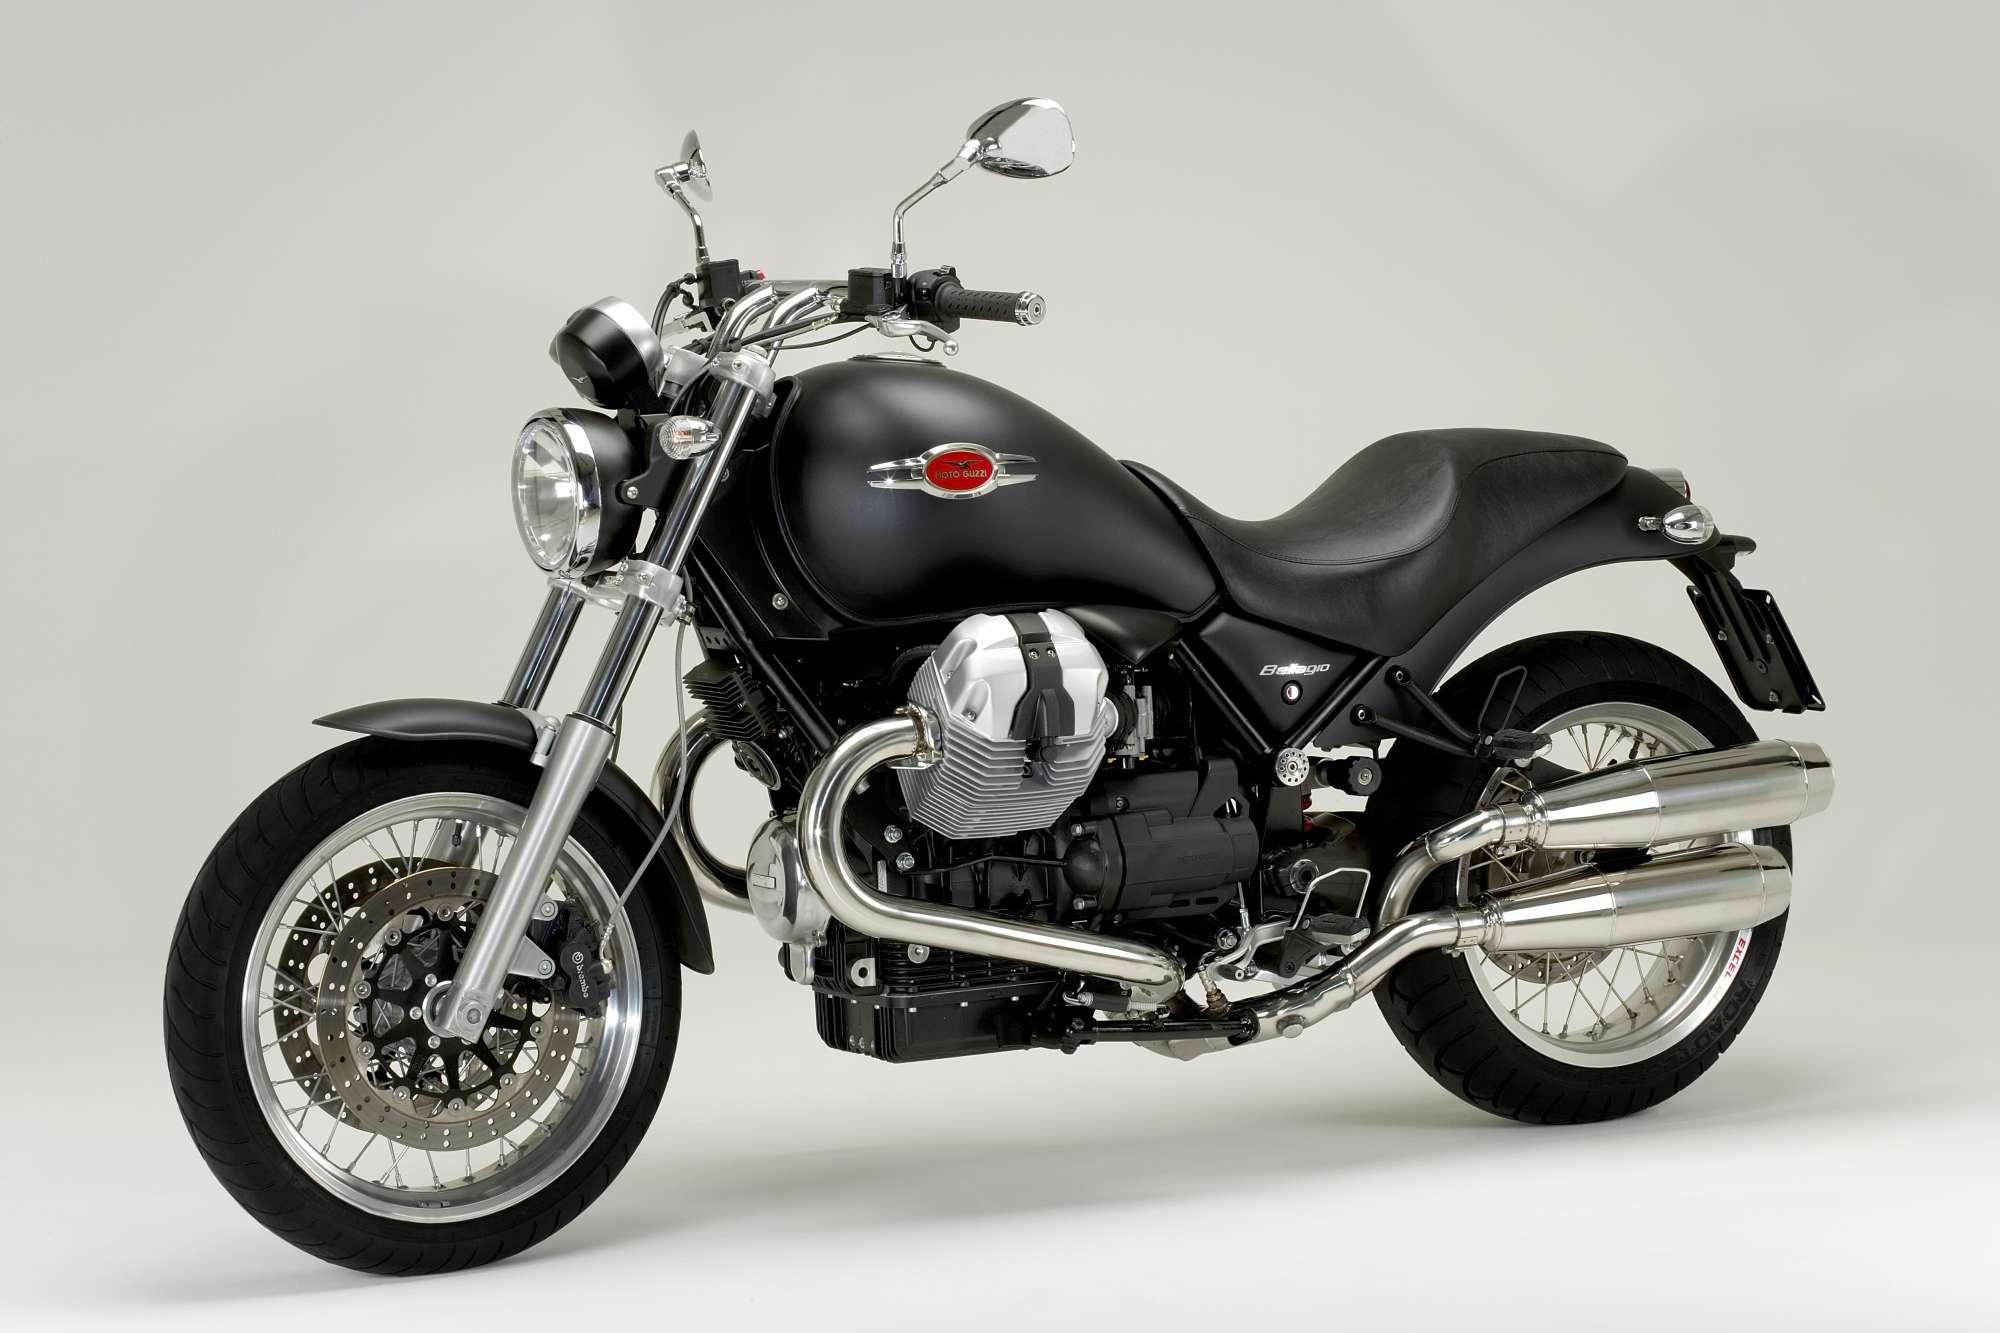 moto guzzi bellagio erfahrungen motorrad bild idee. Black Bedroom Furniture Sets. Home Design Ideas